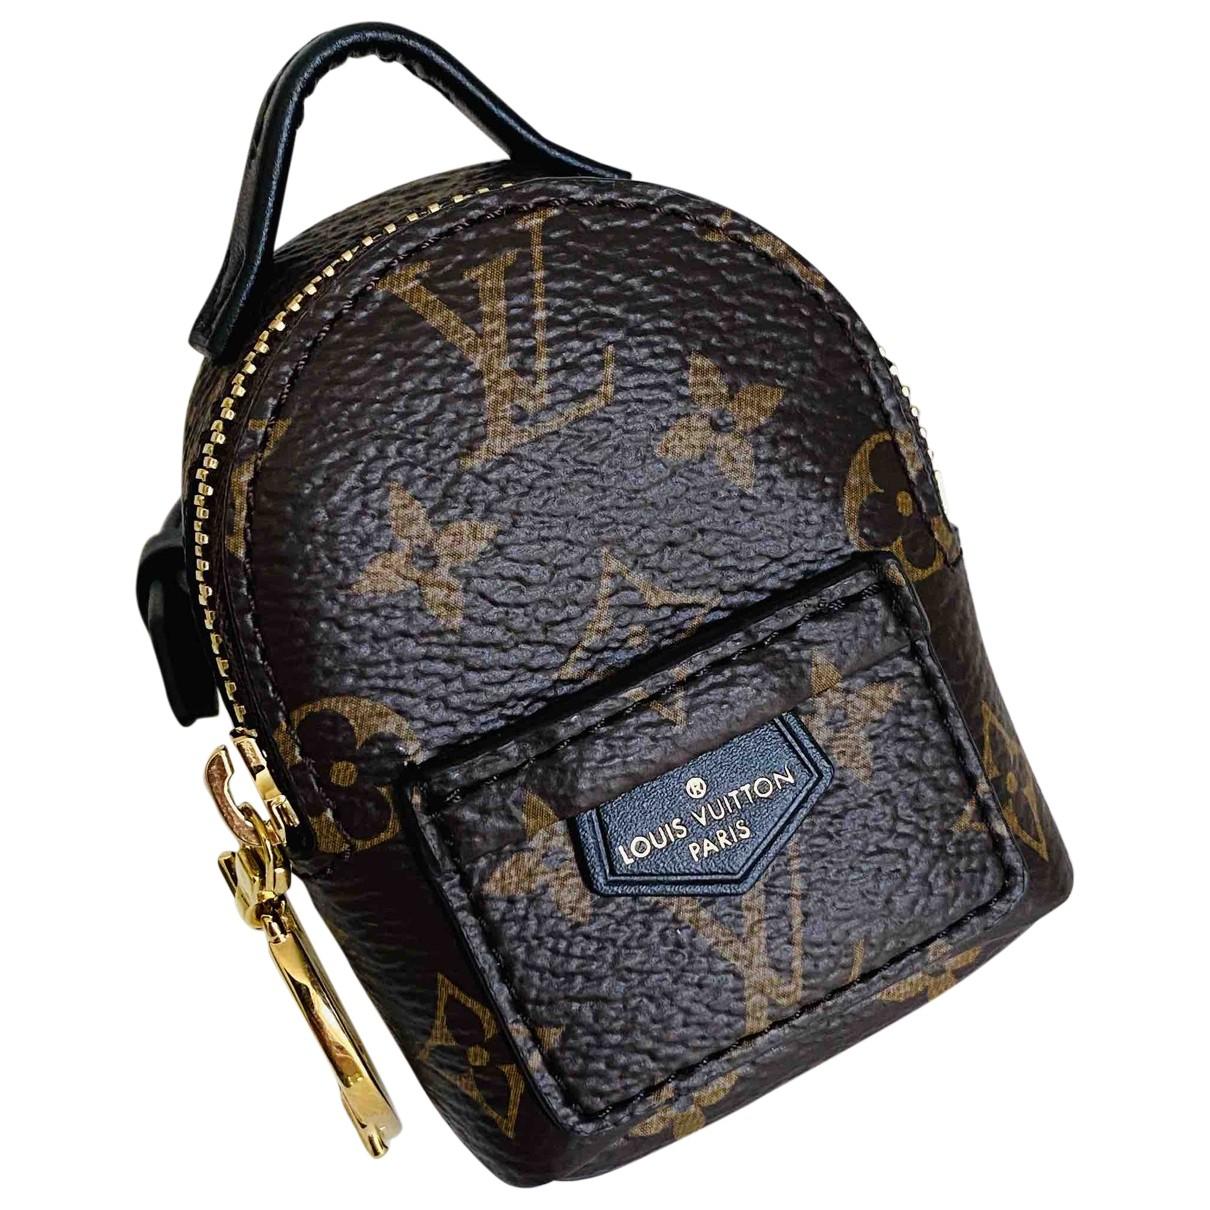 Pulsera de Lona Louis Vuitton